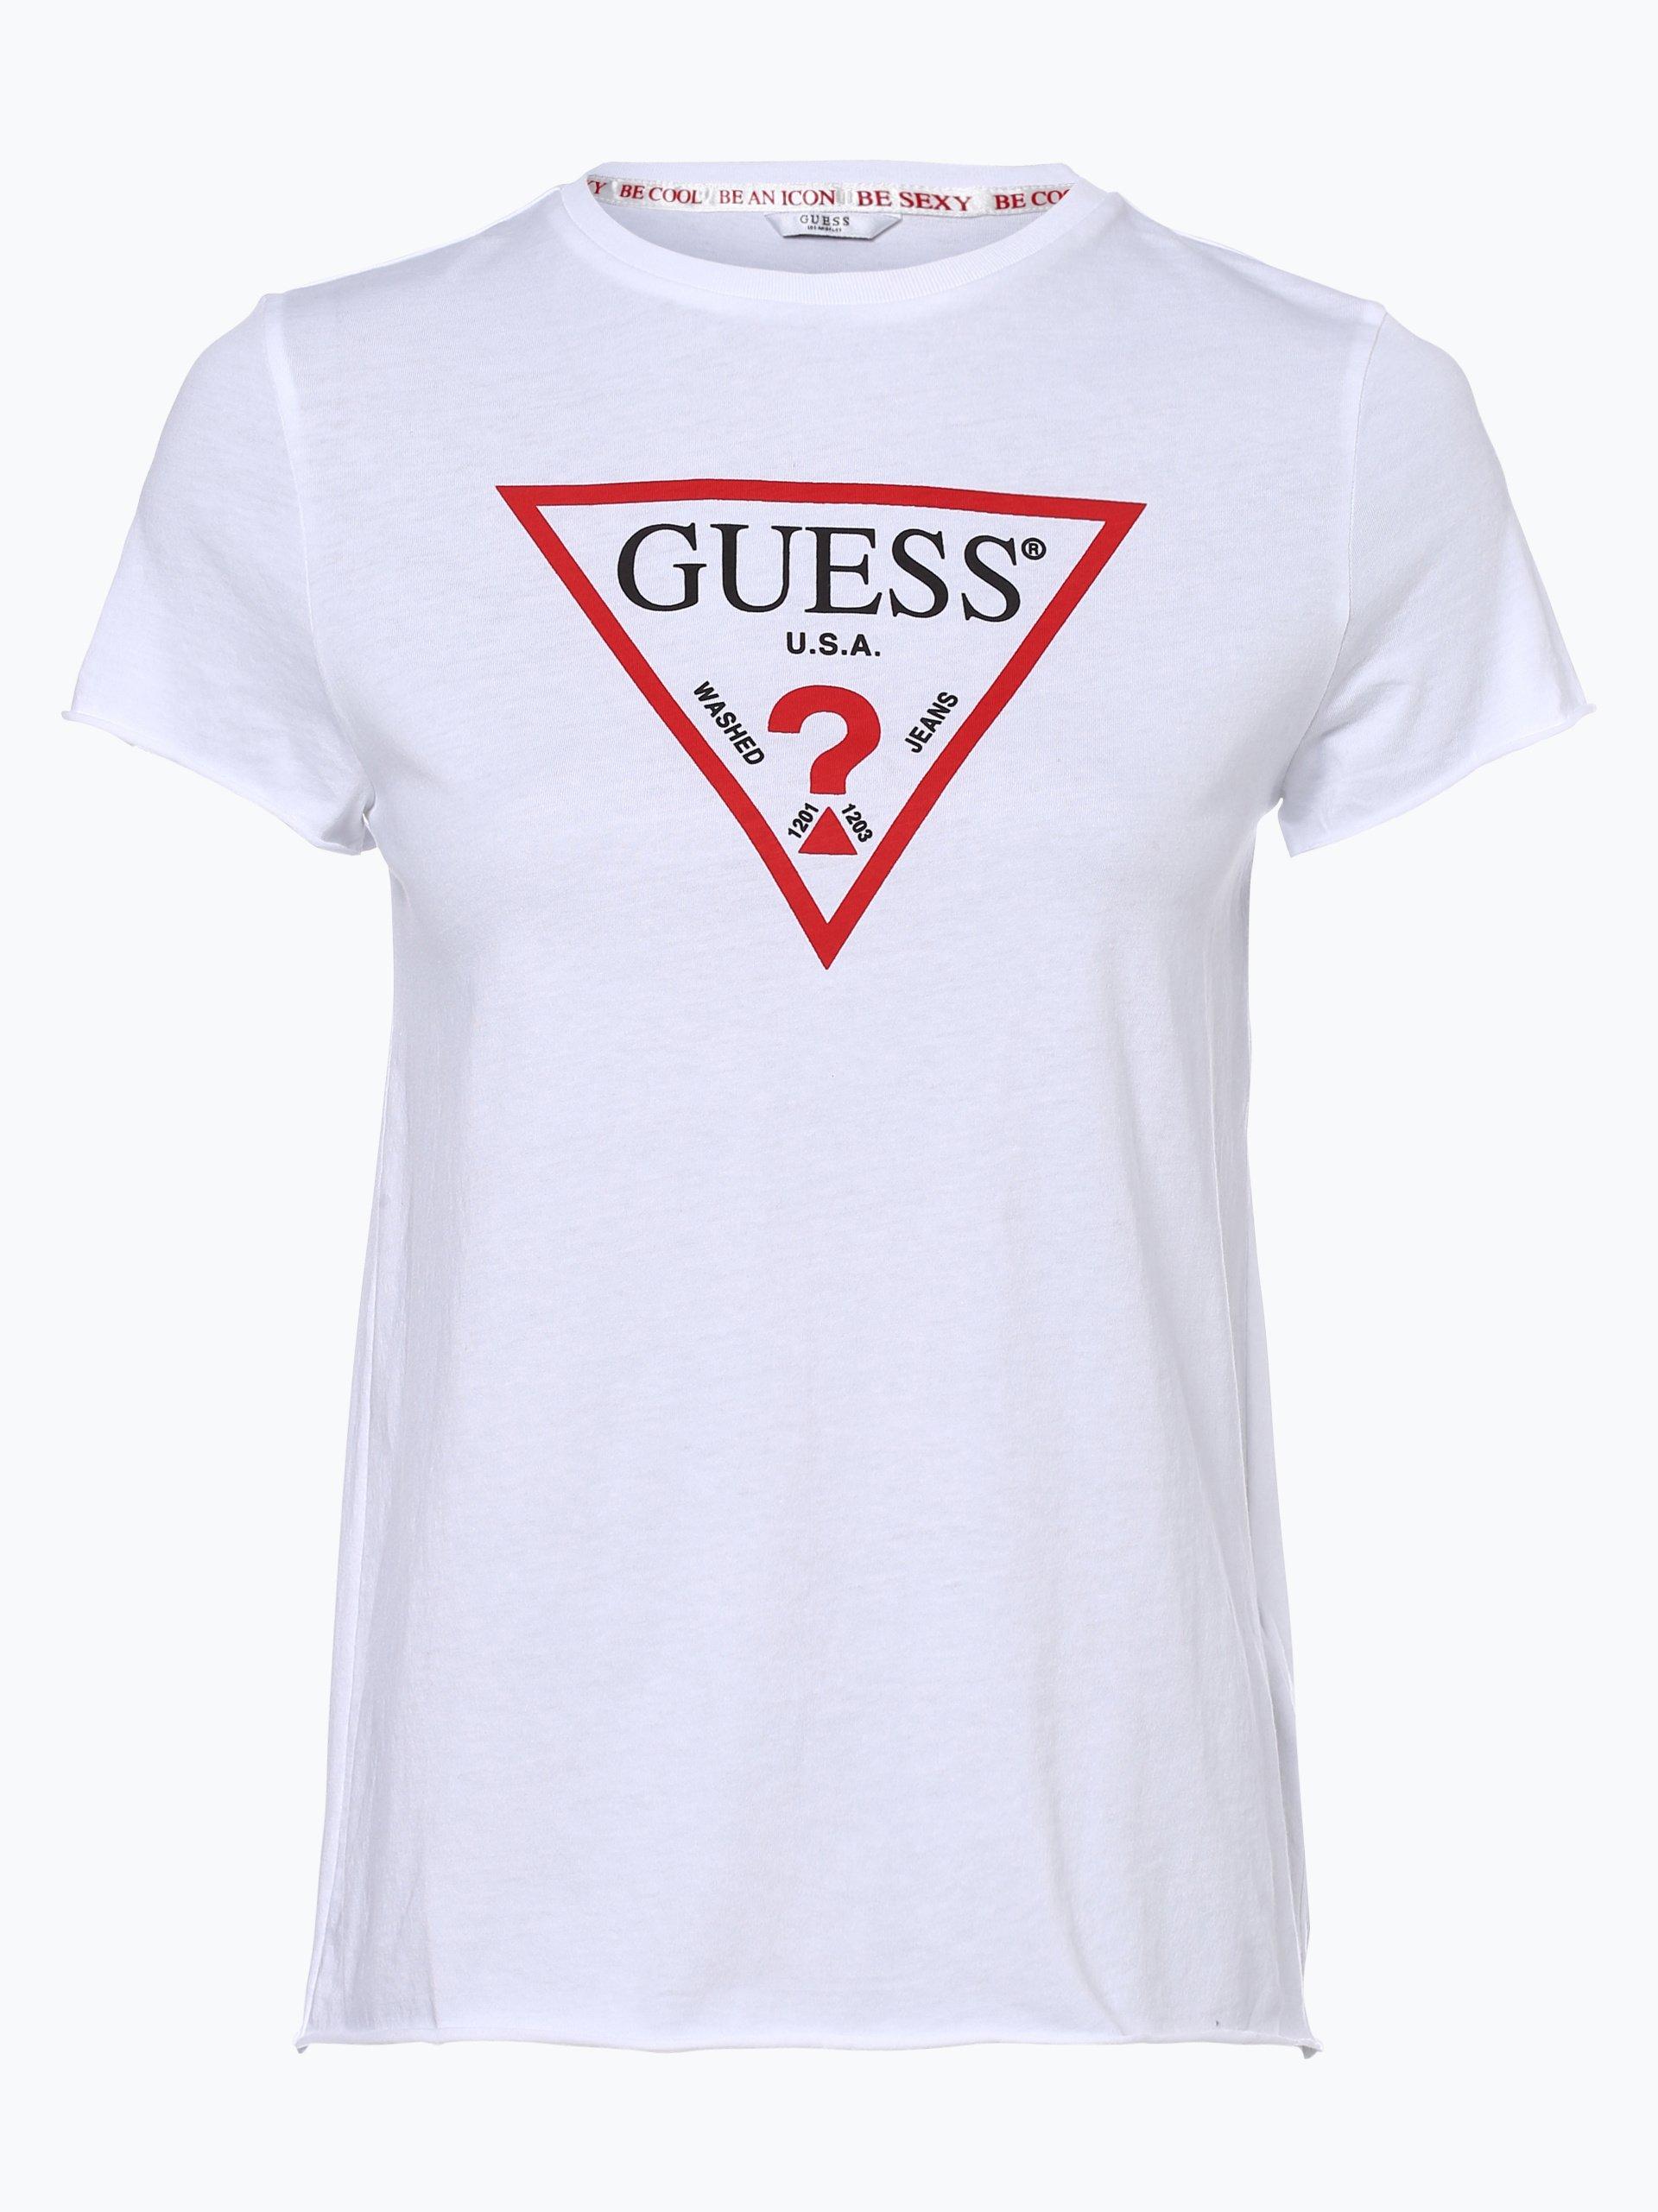 Guess Jeans T Shirt Damski Kup Online Vangraaf Com